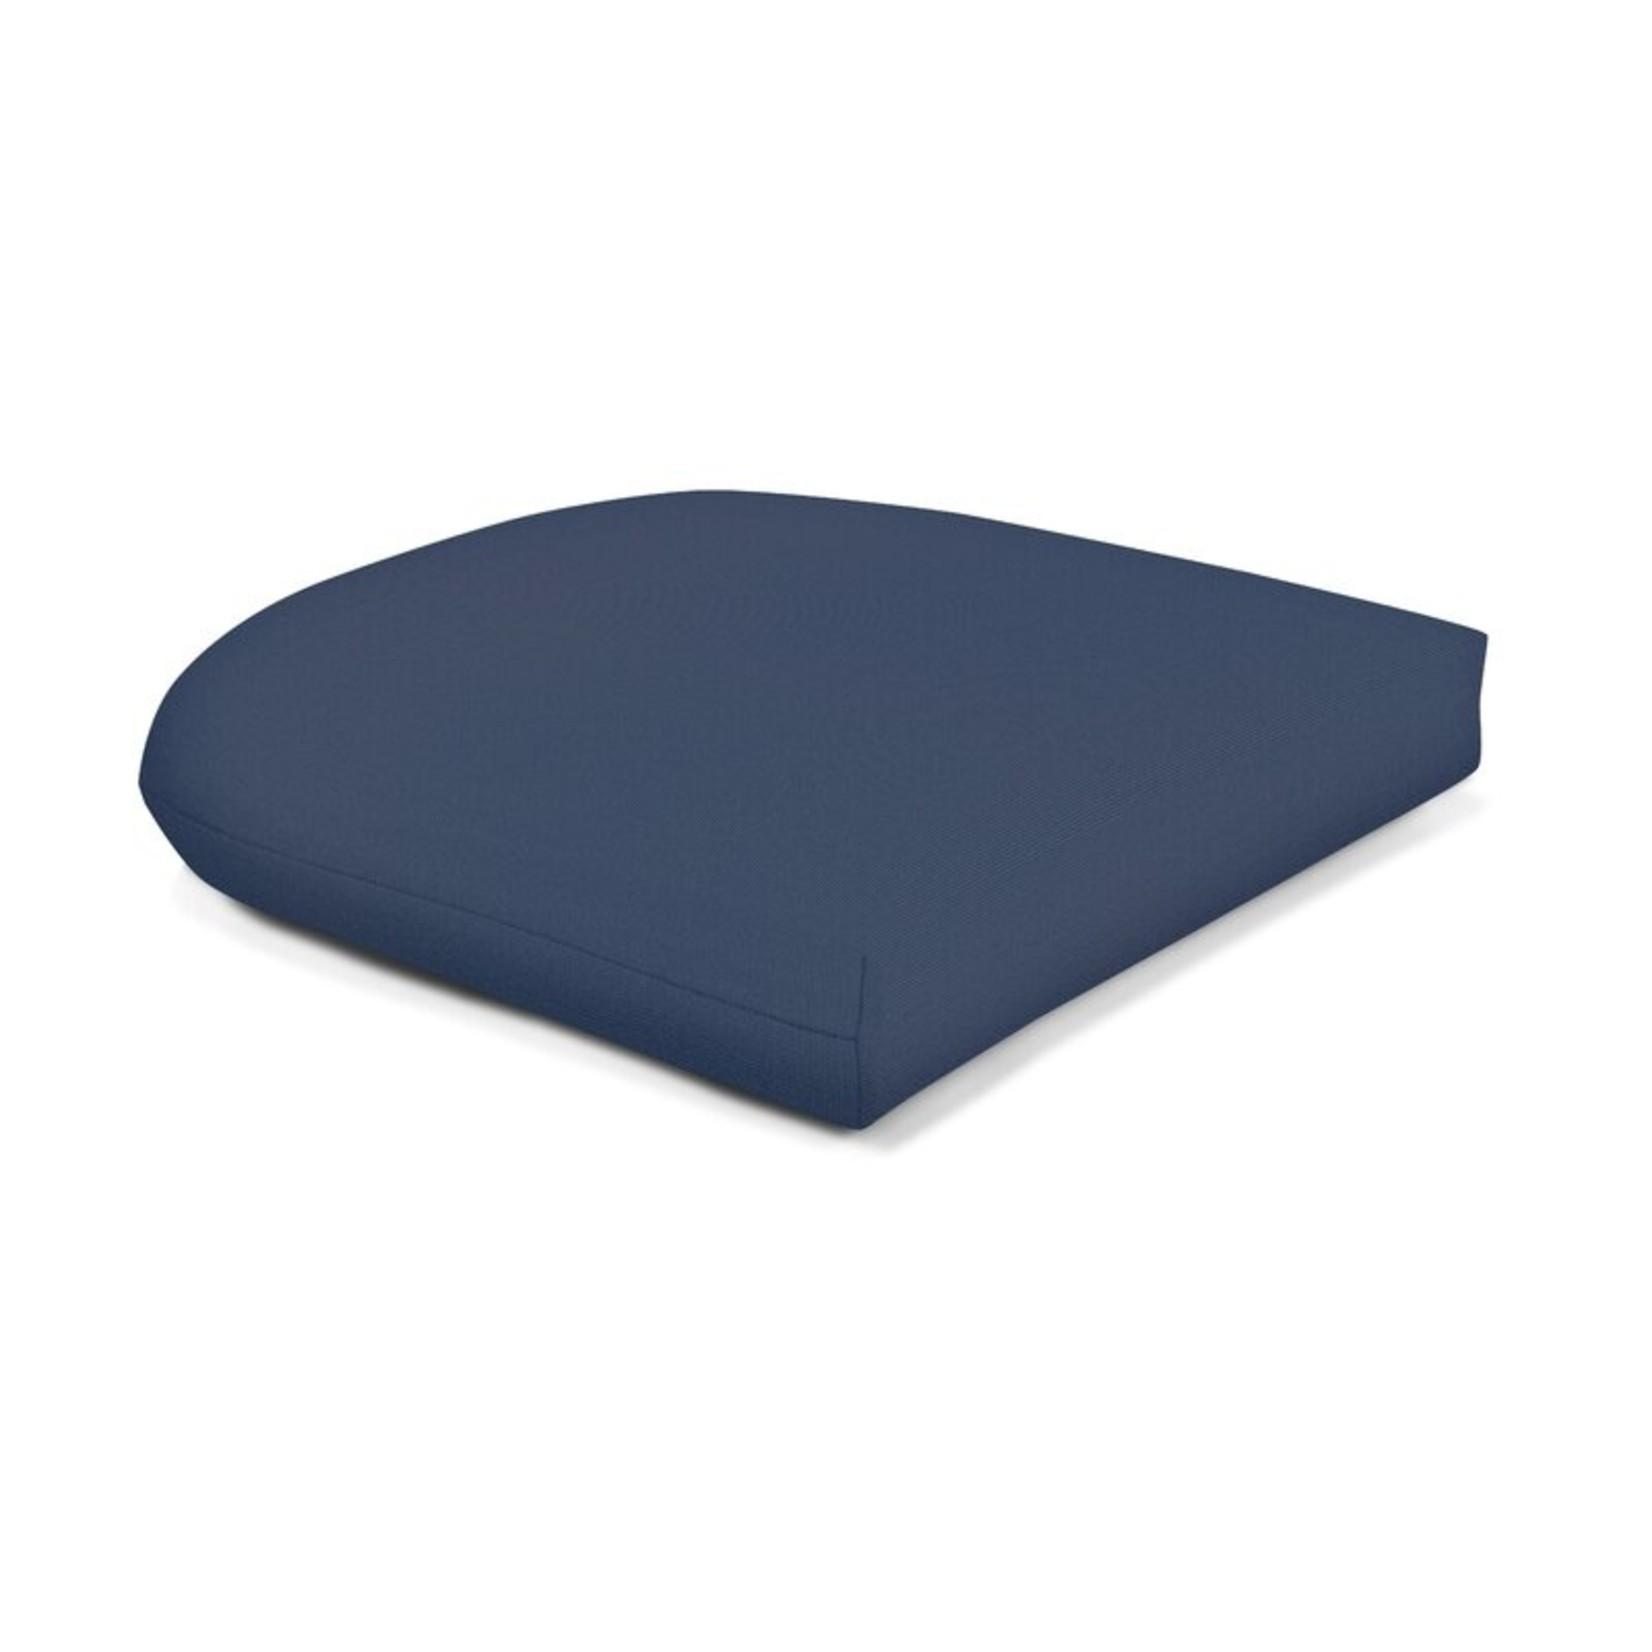 *Outdoor Sunbrella Seat Cushion - Set of 4 - Blue